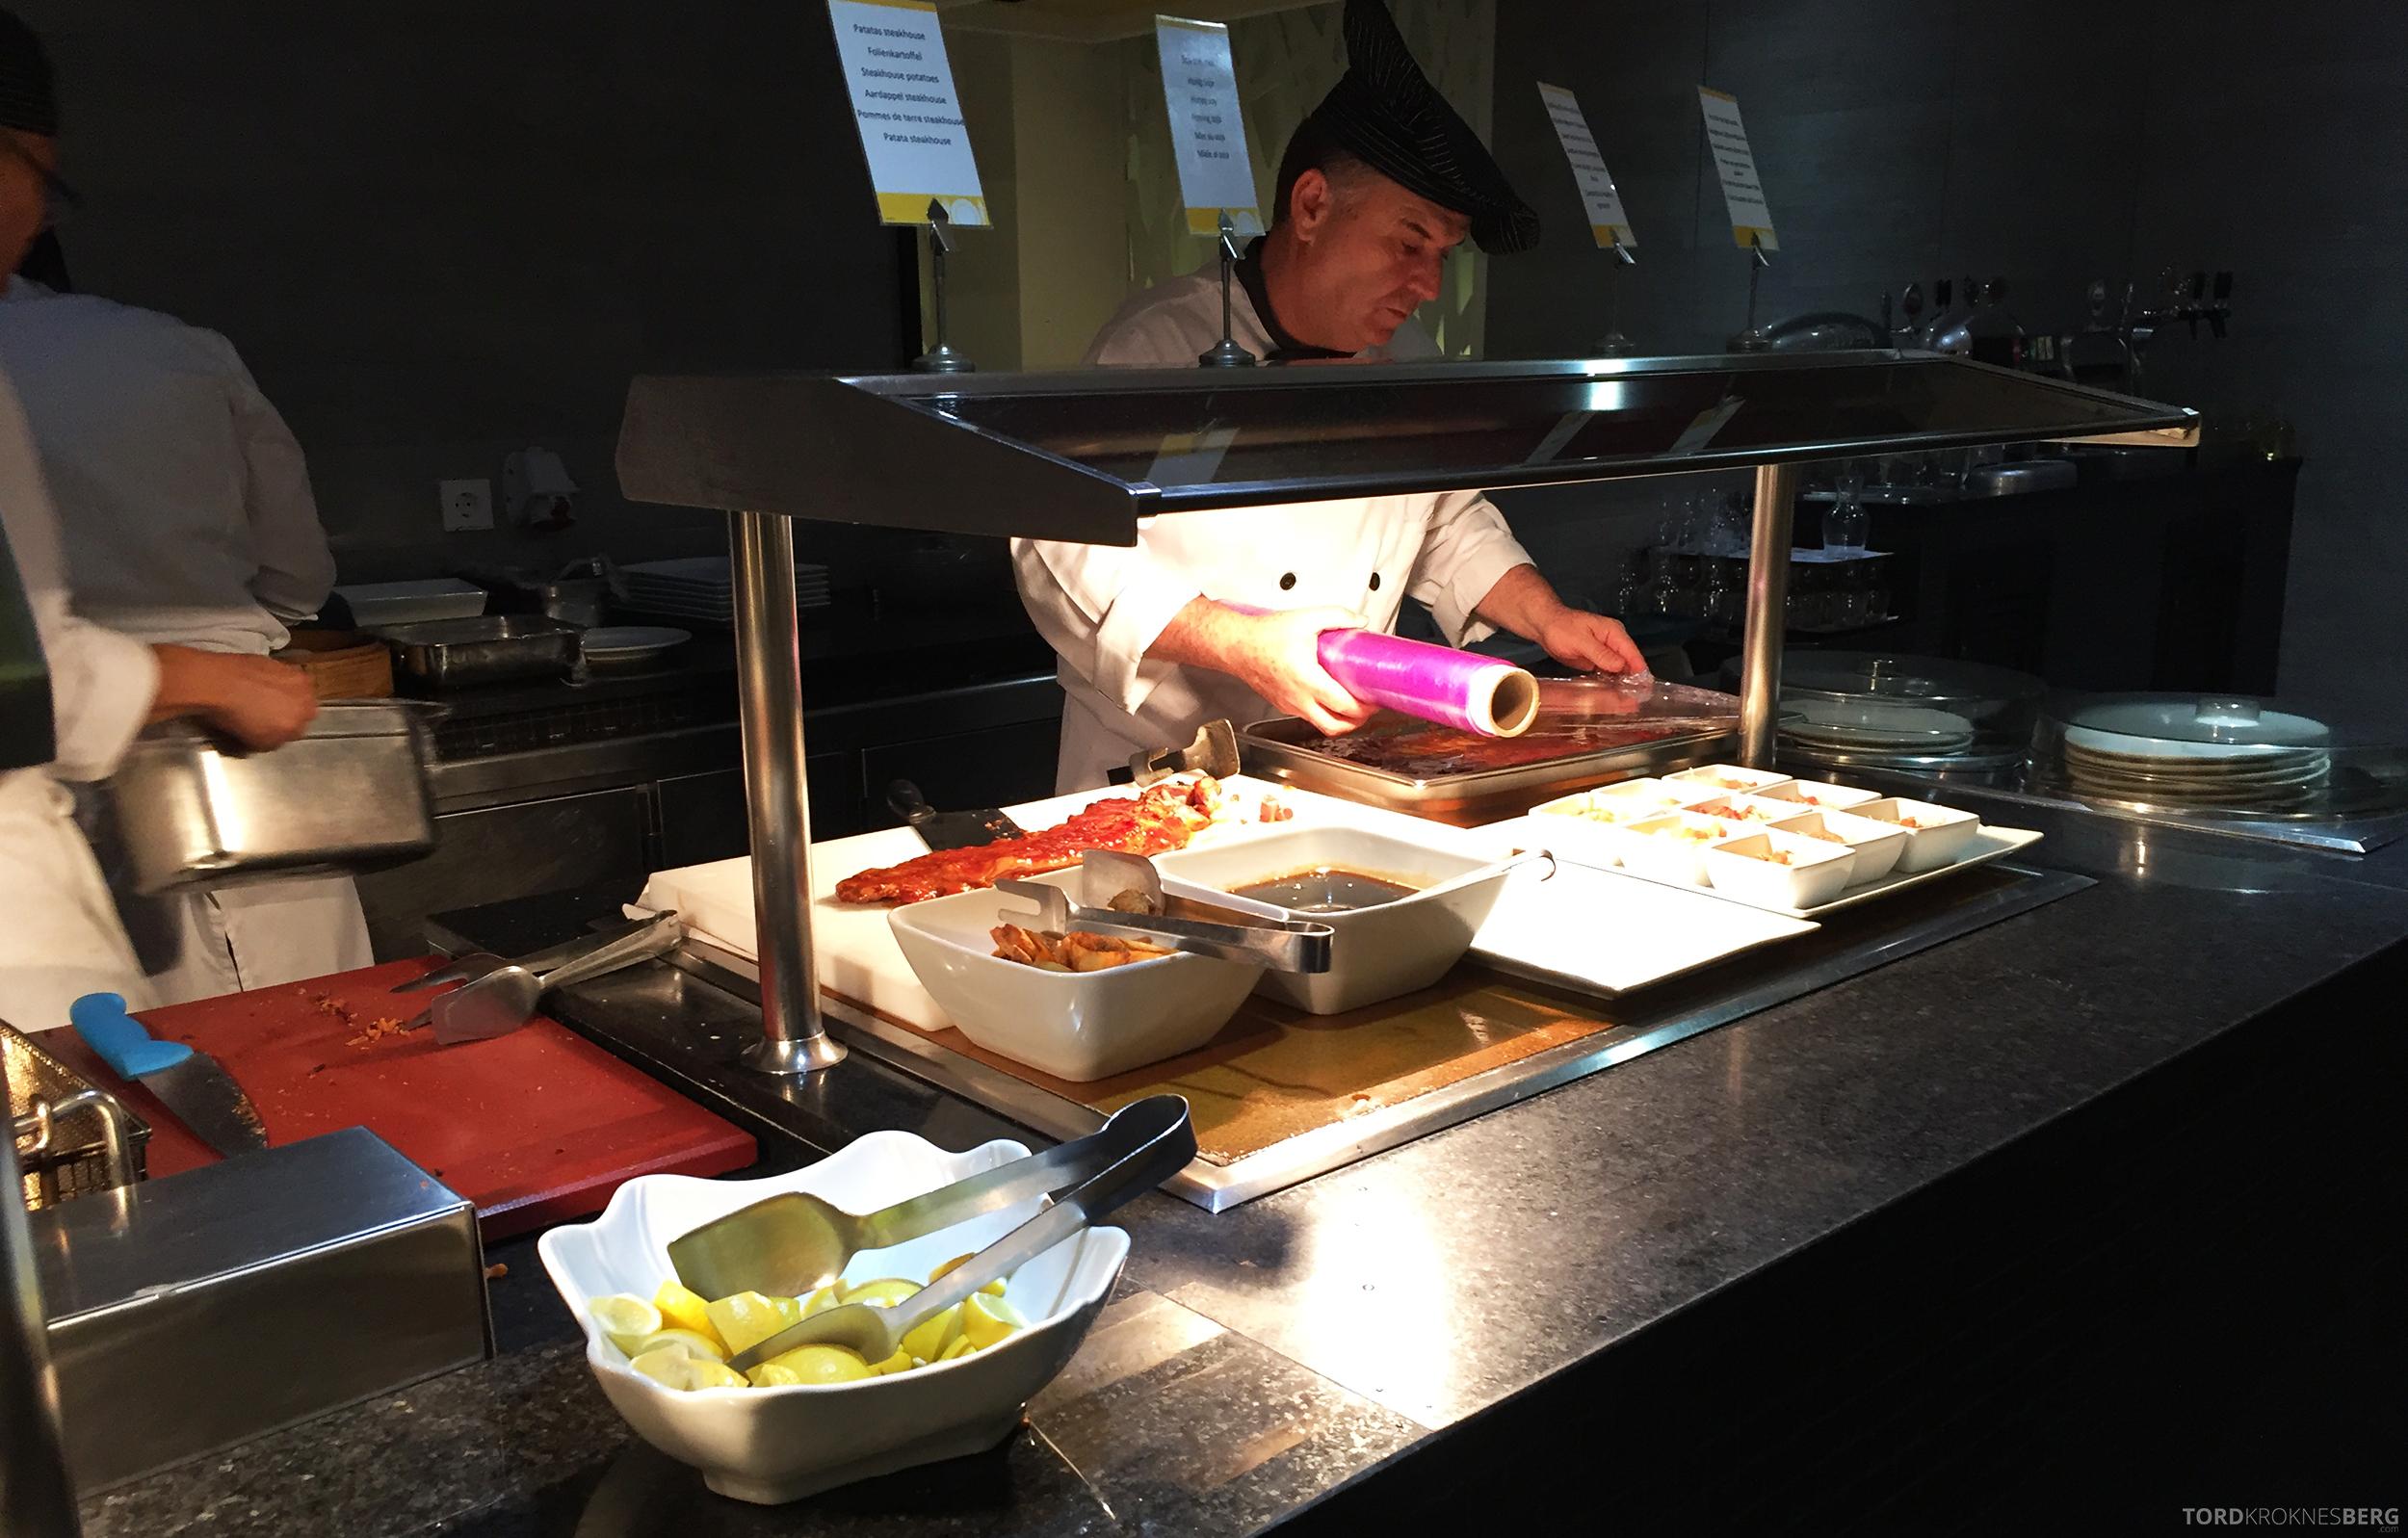 ClubHotel RIU Gran Canaria asiatisk tilberedelse